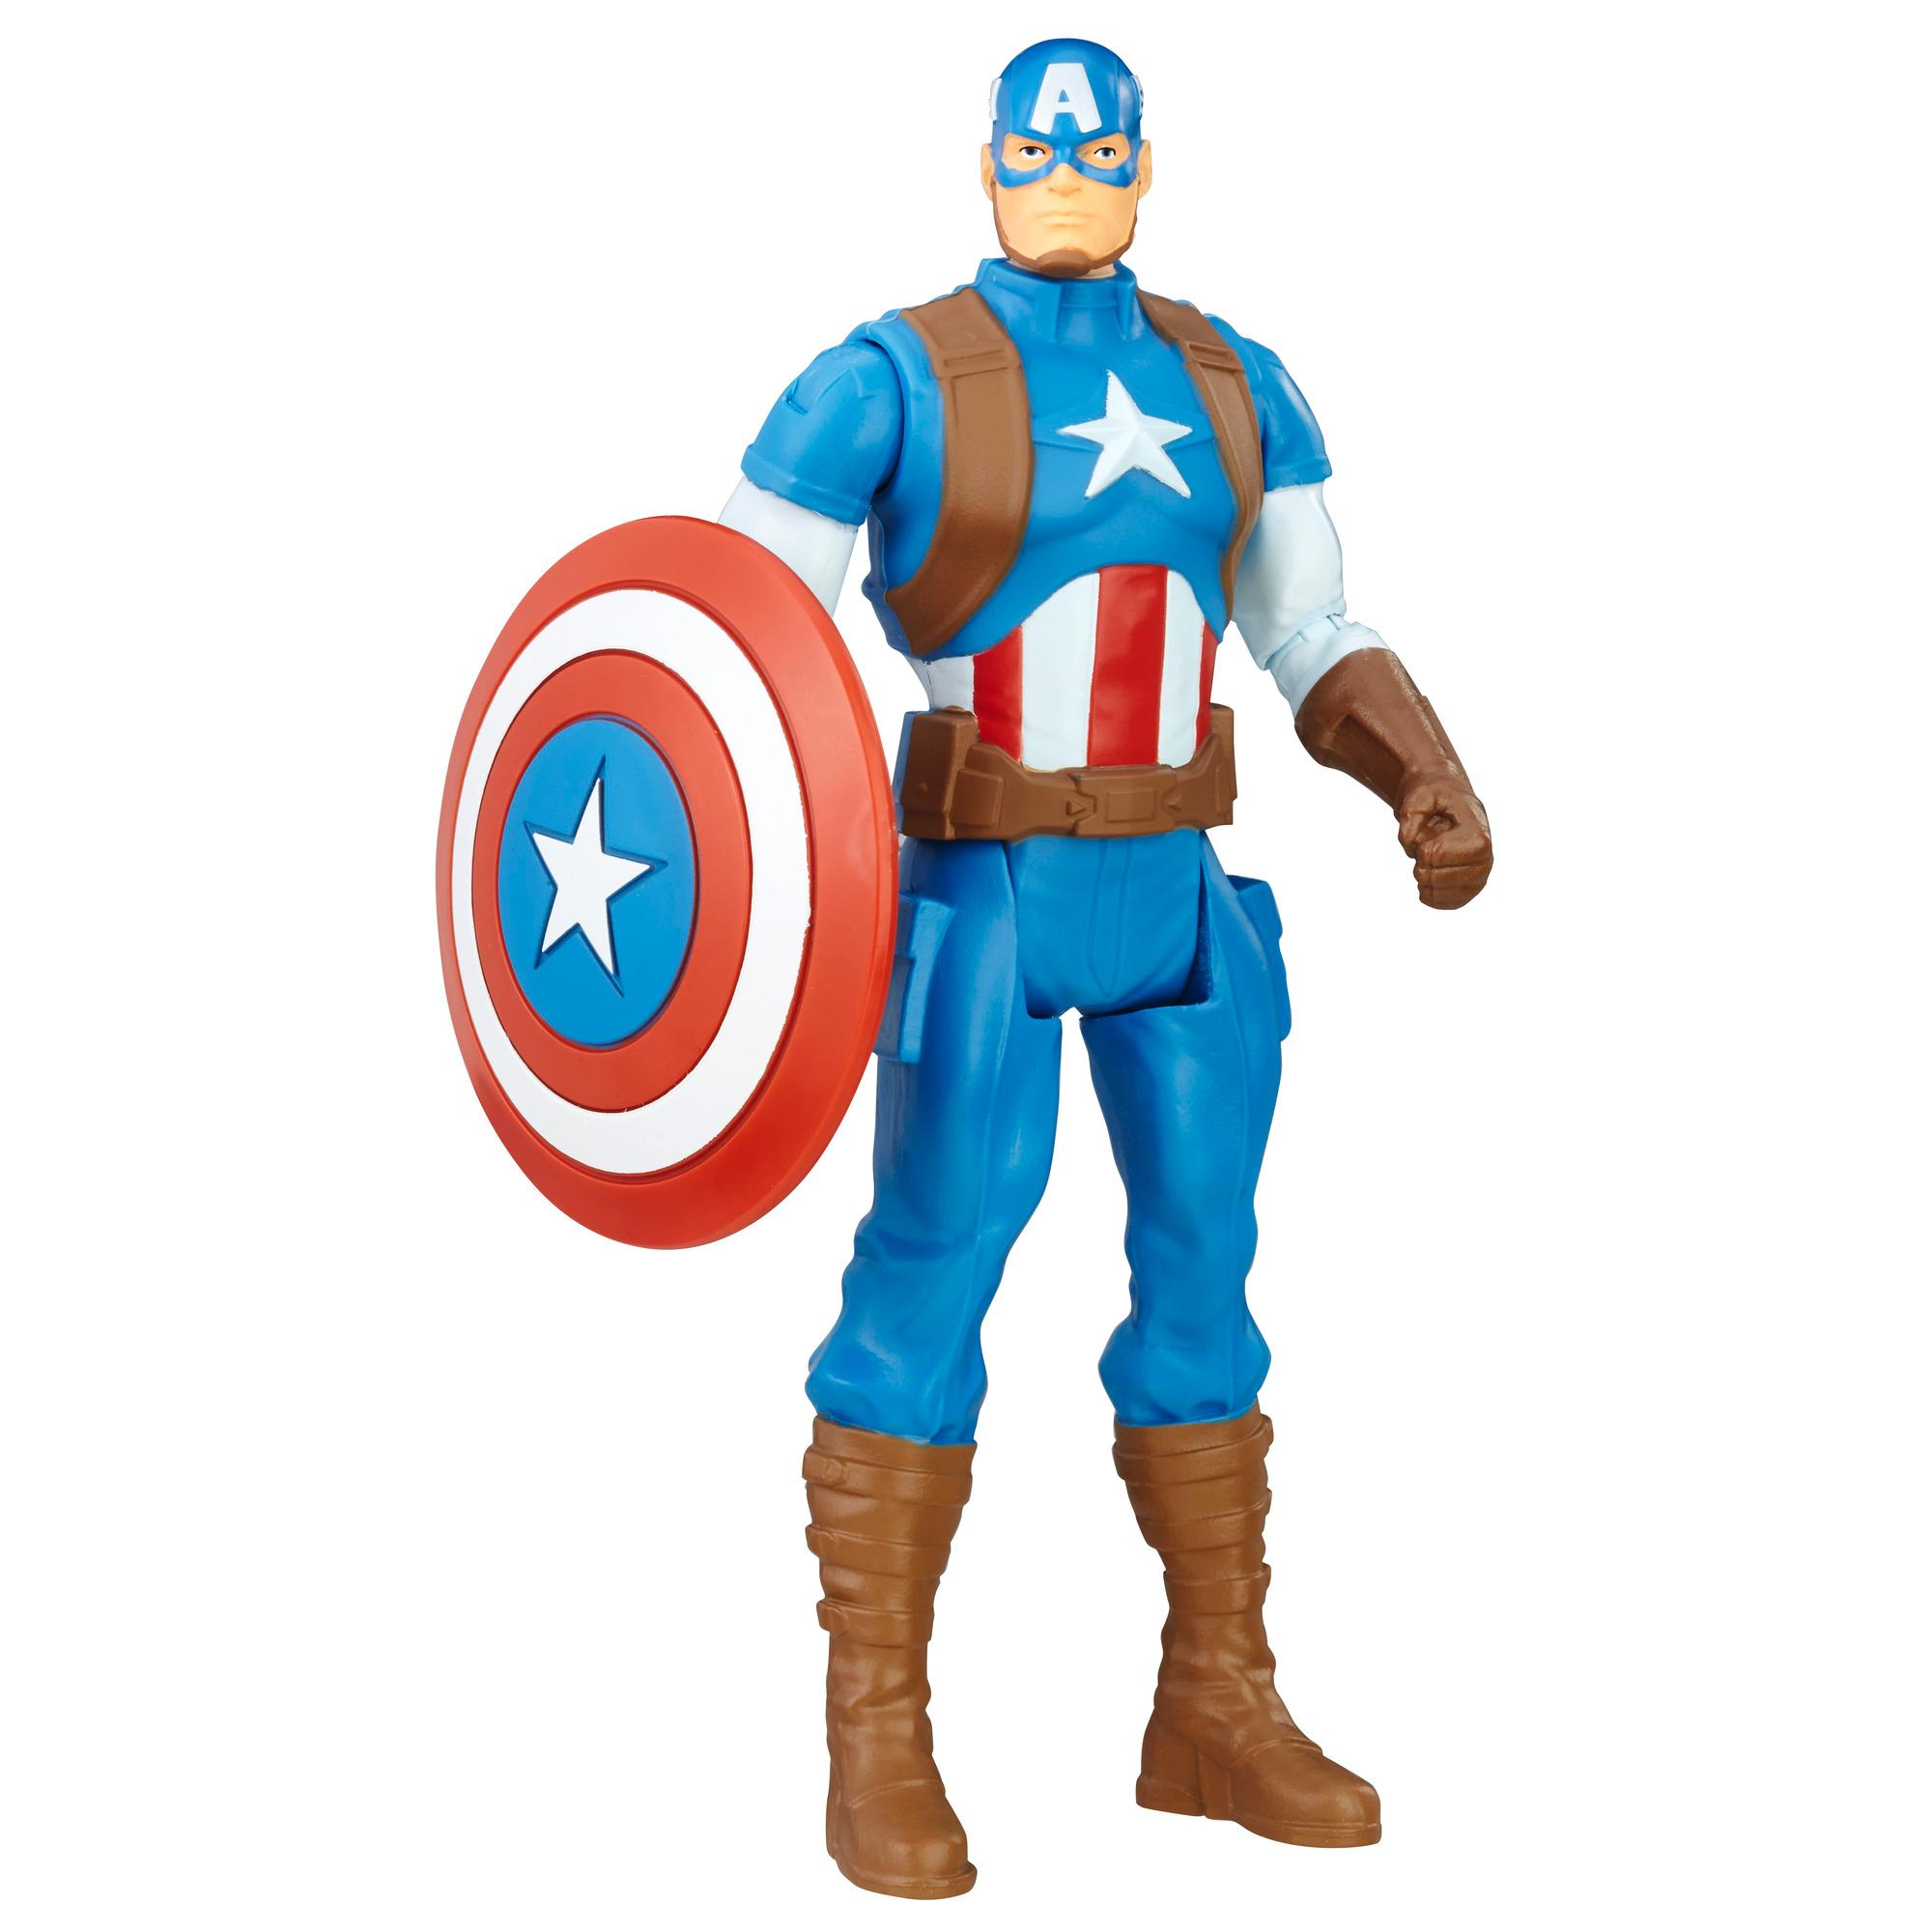 Marvel Avengers - Figurine de base Captain America de 15 cm